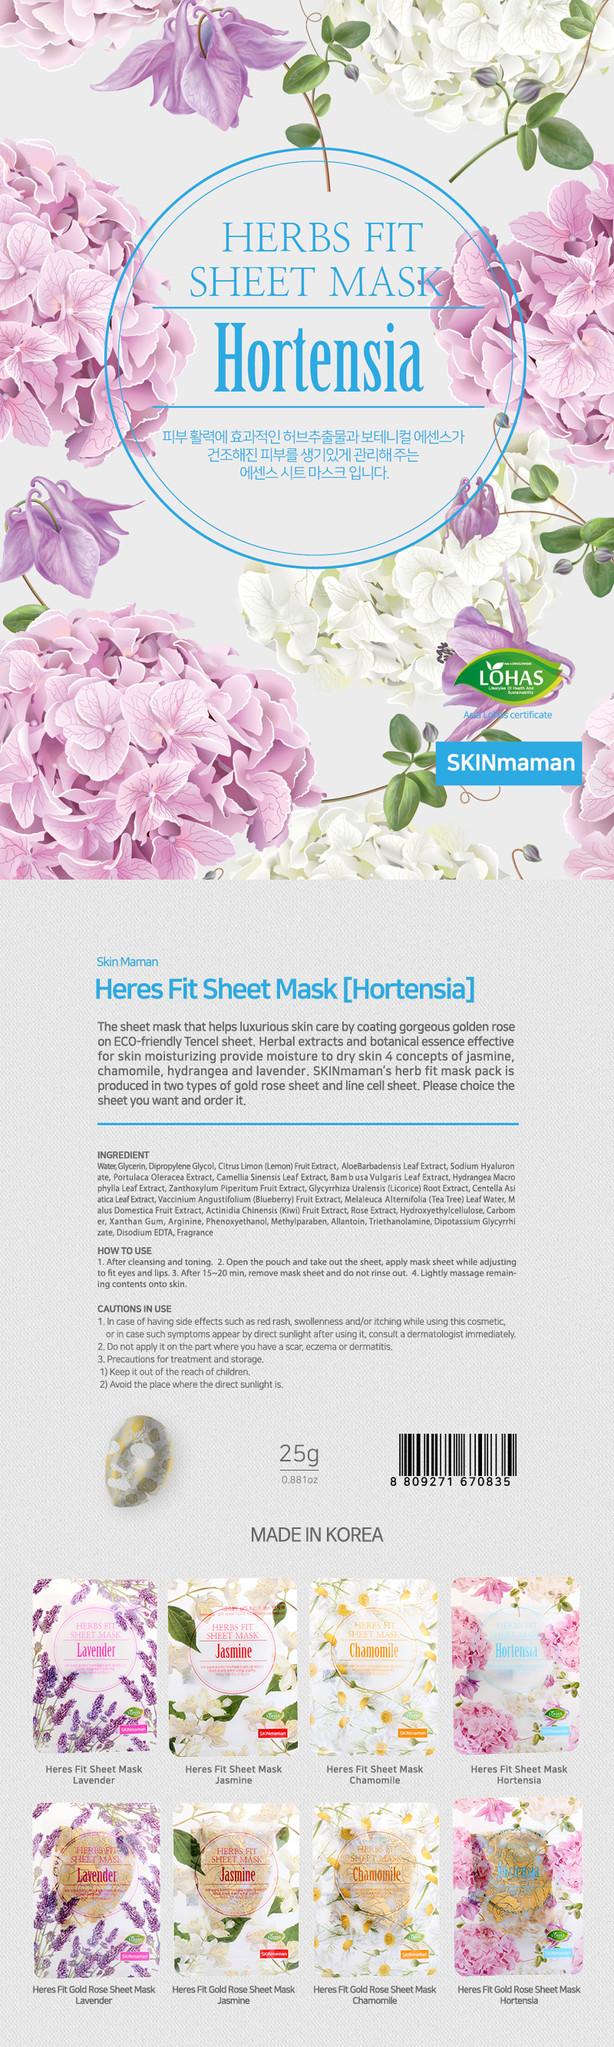 Skinmaman Herbs Fit Gold Rose Sheet Mask [Hortensia]-2